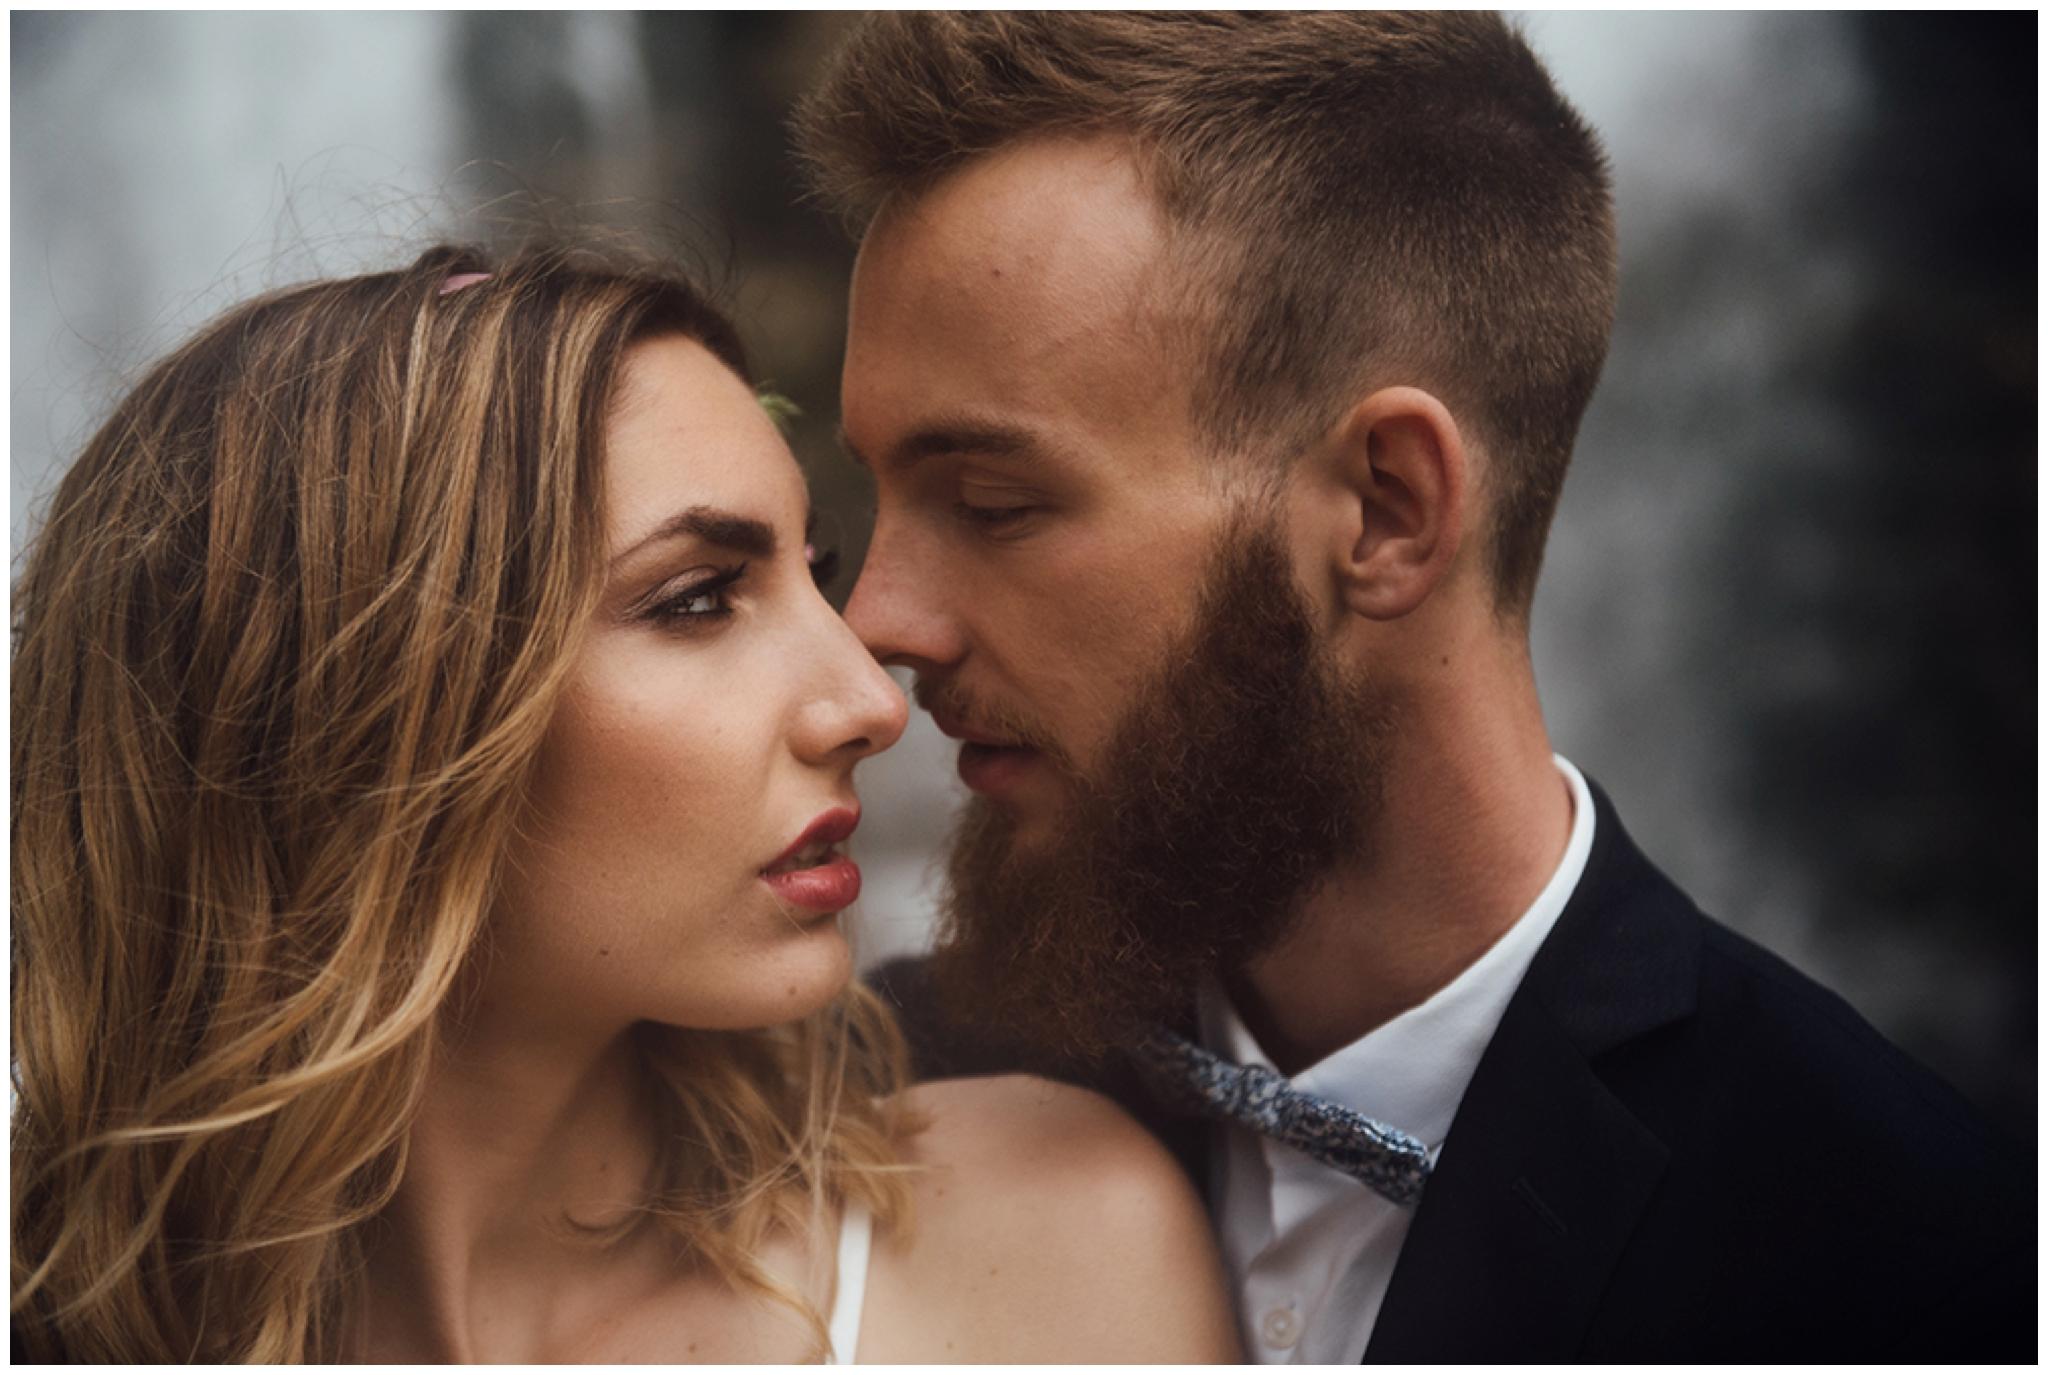 photographe-mariage-grenoble-annecy-lyon-shooting-inspiration-boheme-038